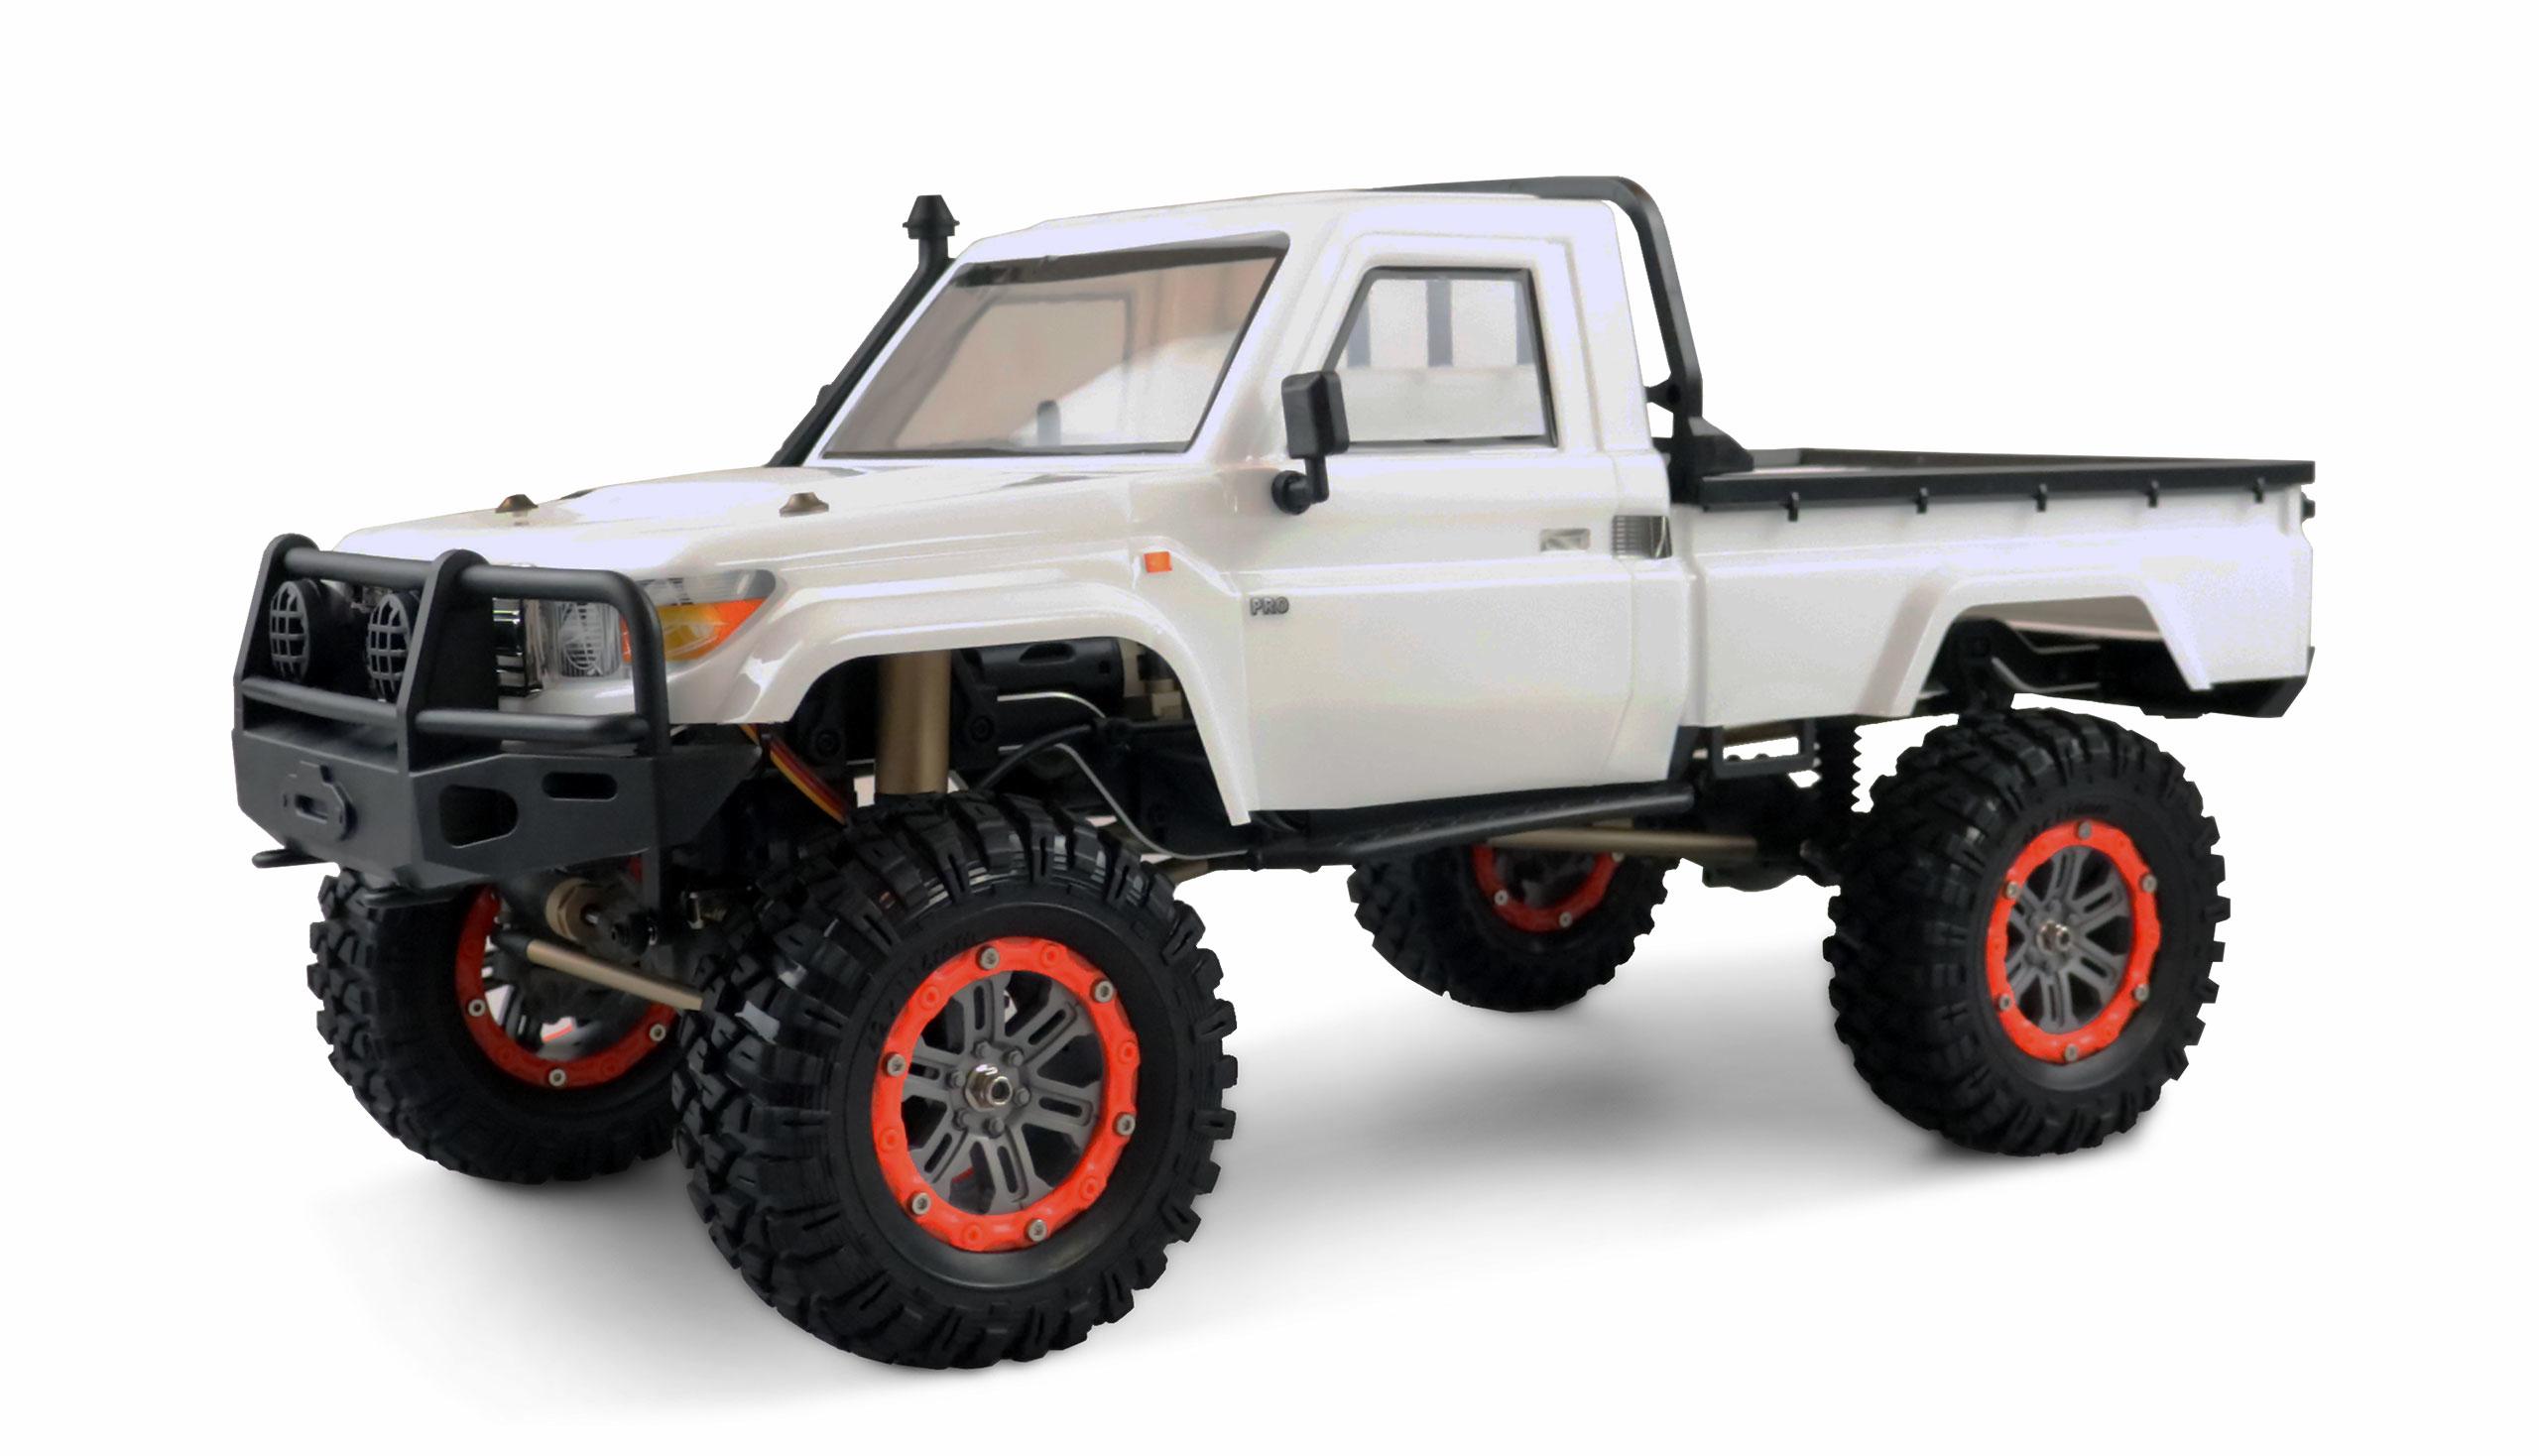 Vorschau: Amewi AMXRock RCX10P Scale Crawler - Raupenfahrzeug - Elektromotor - 1:10 - Betriebsbereit (RTR) - Schwarz - Weiß - Aluminium - Metall